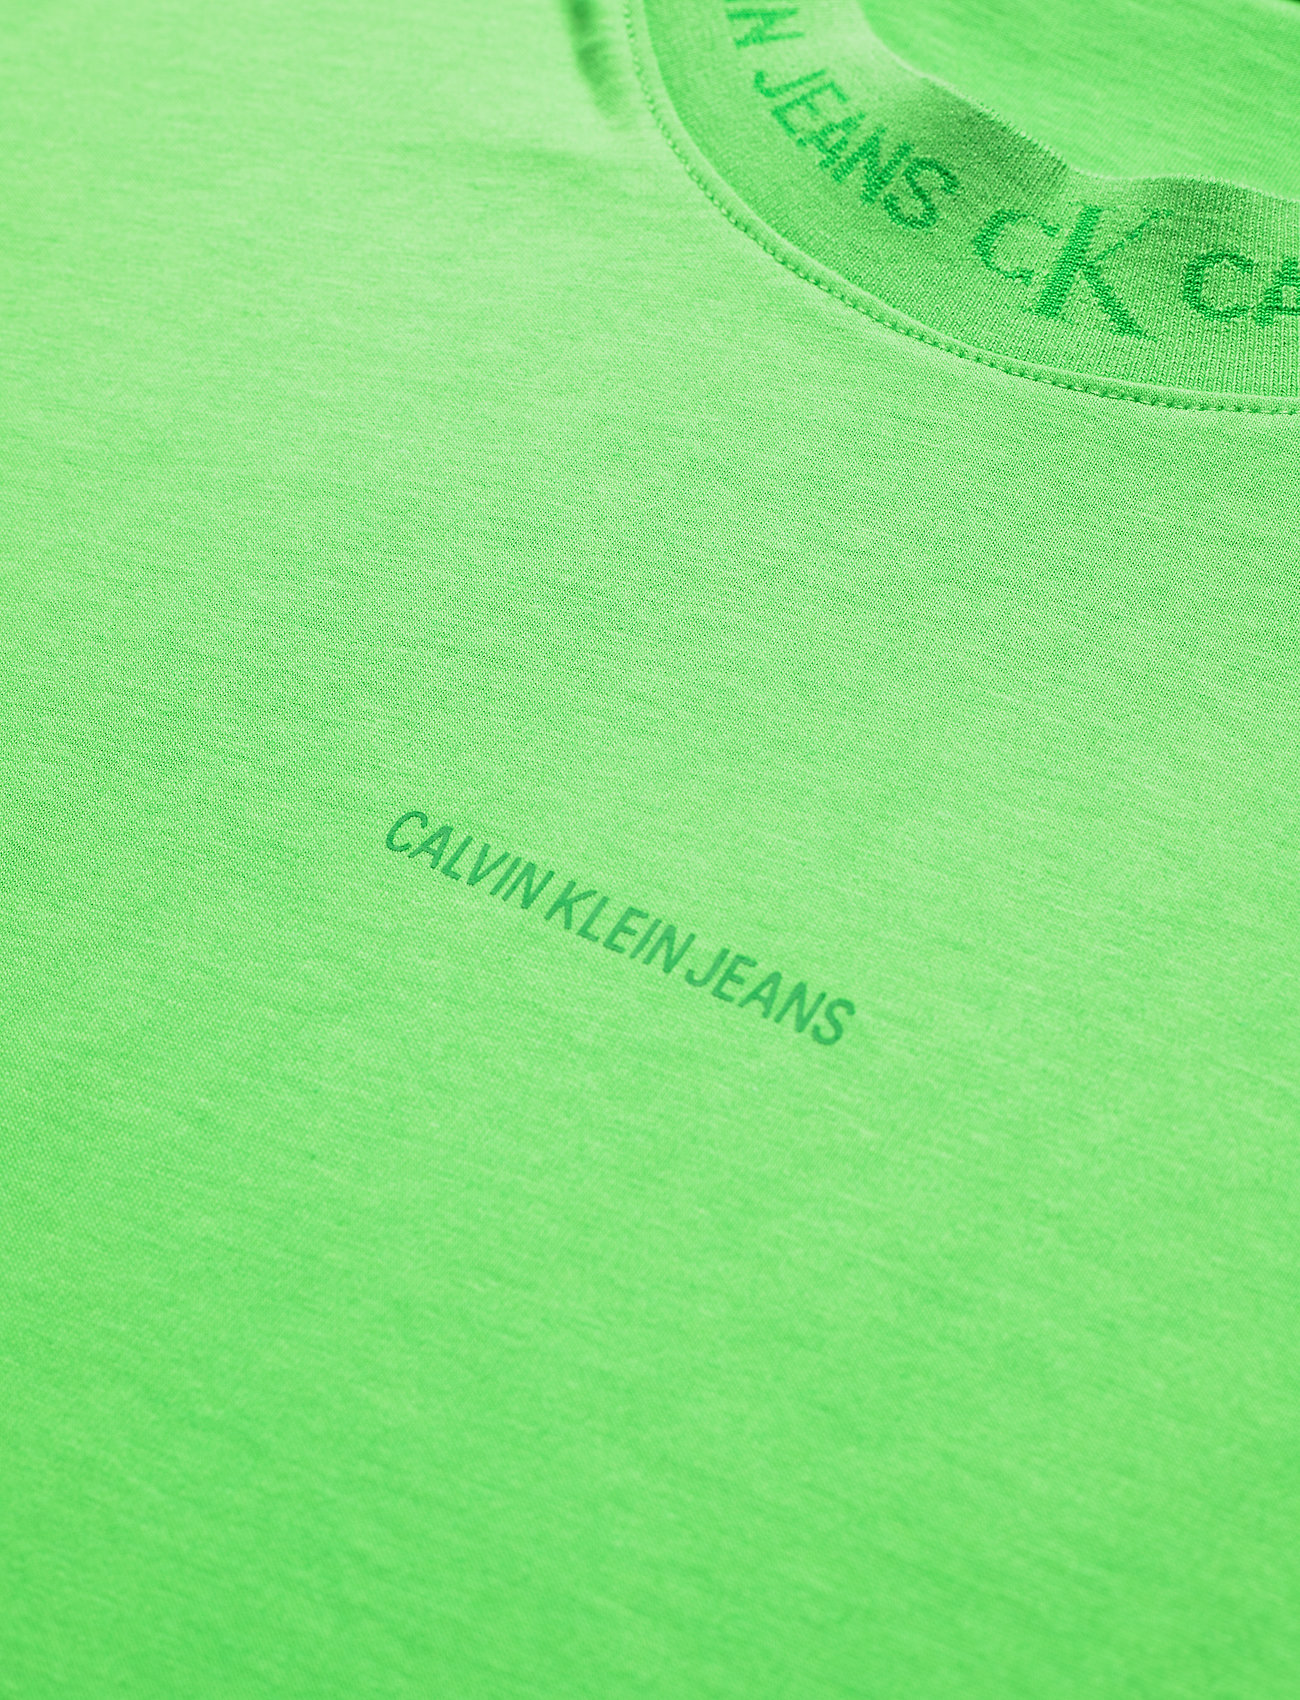 Calvin Klein Jeans - LOGO JACQUARD TEE - t-shirts basiques - acid green - 2